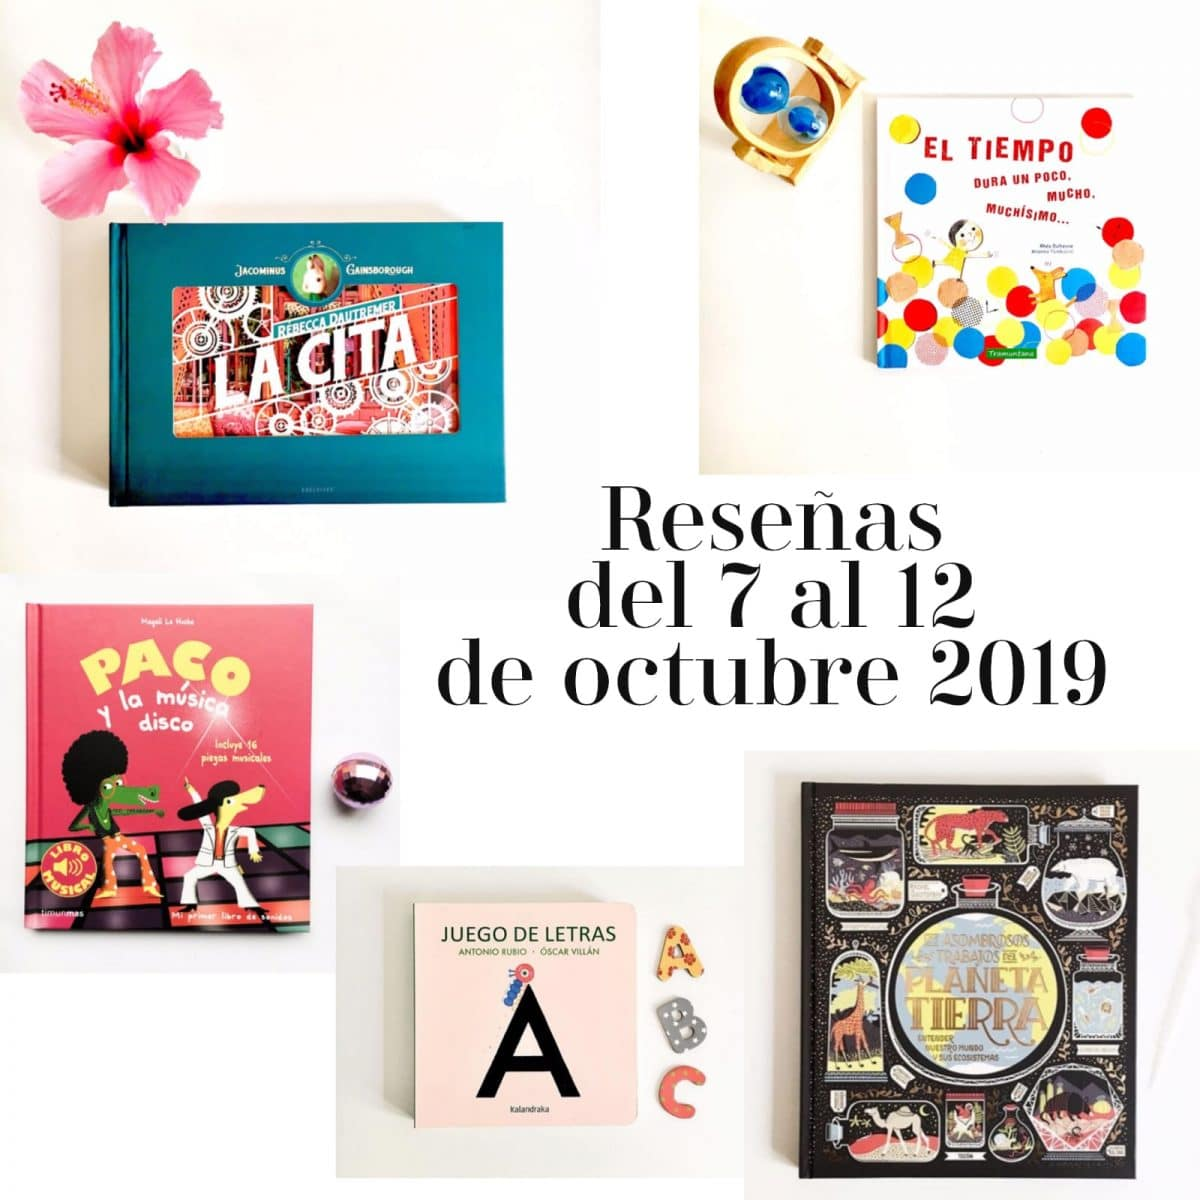 reseñas segunda semana octubre 2019